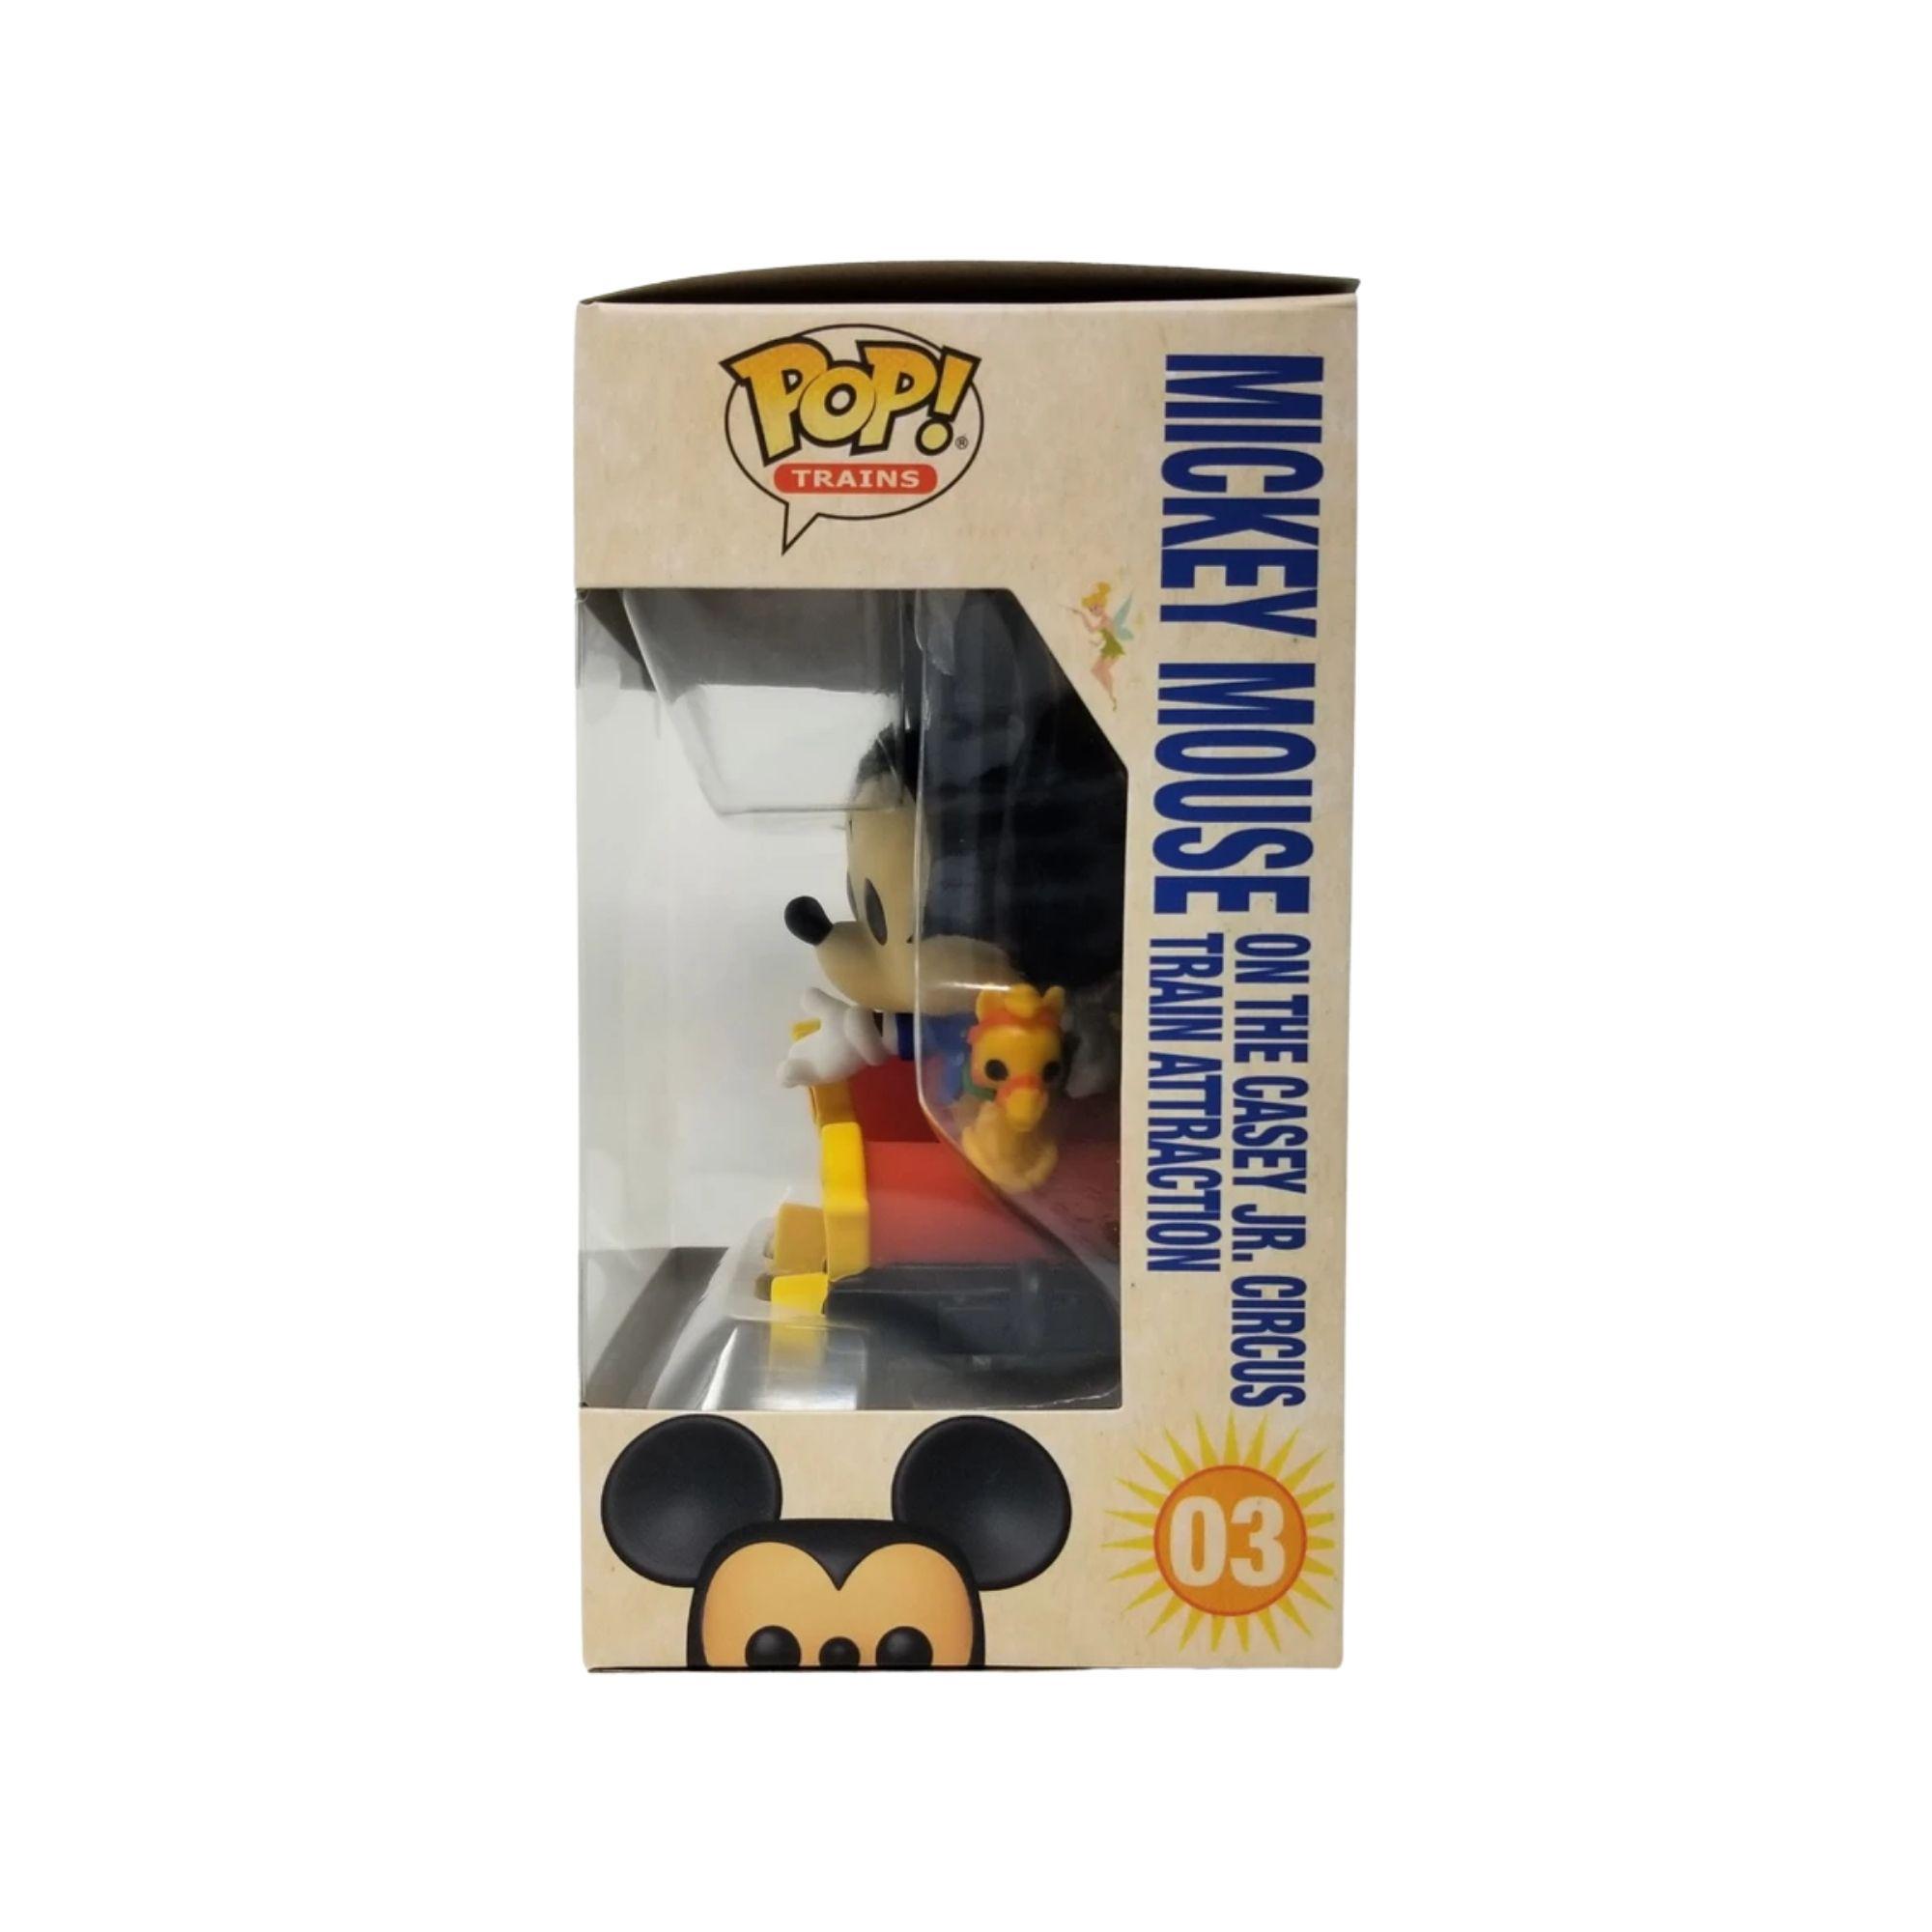 Funko Pop Disneyland 65th Mickey Mouse Train  #03  - Game Land Brinquedos